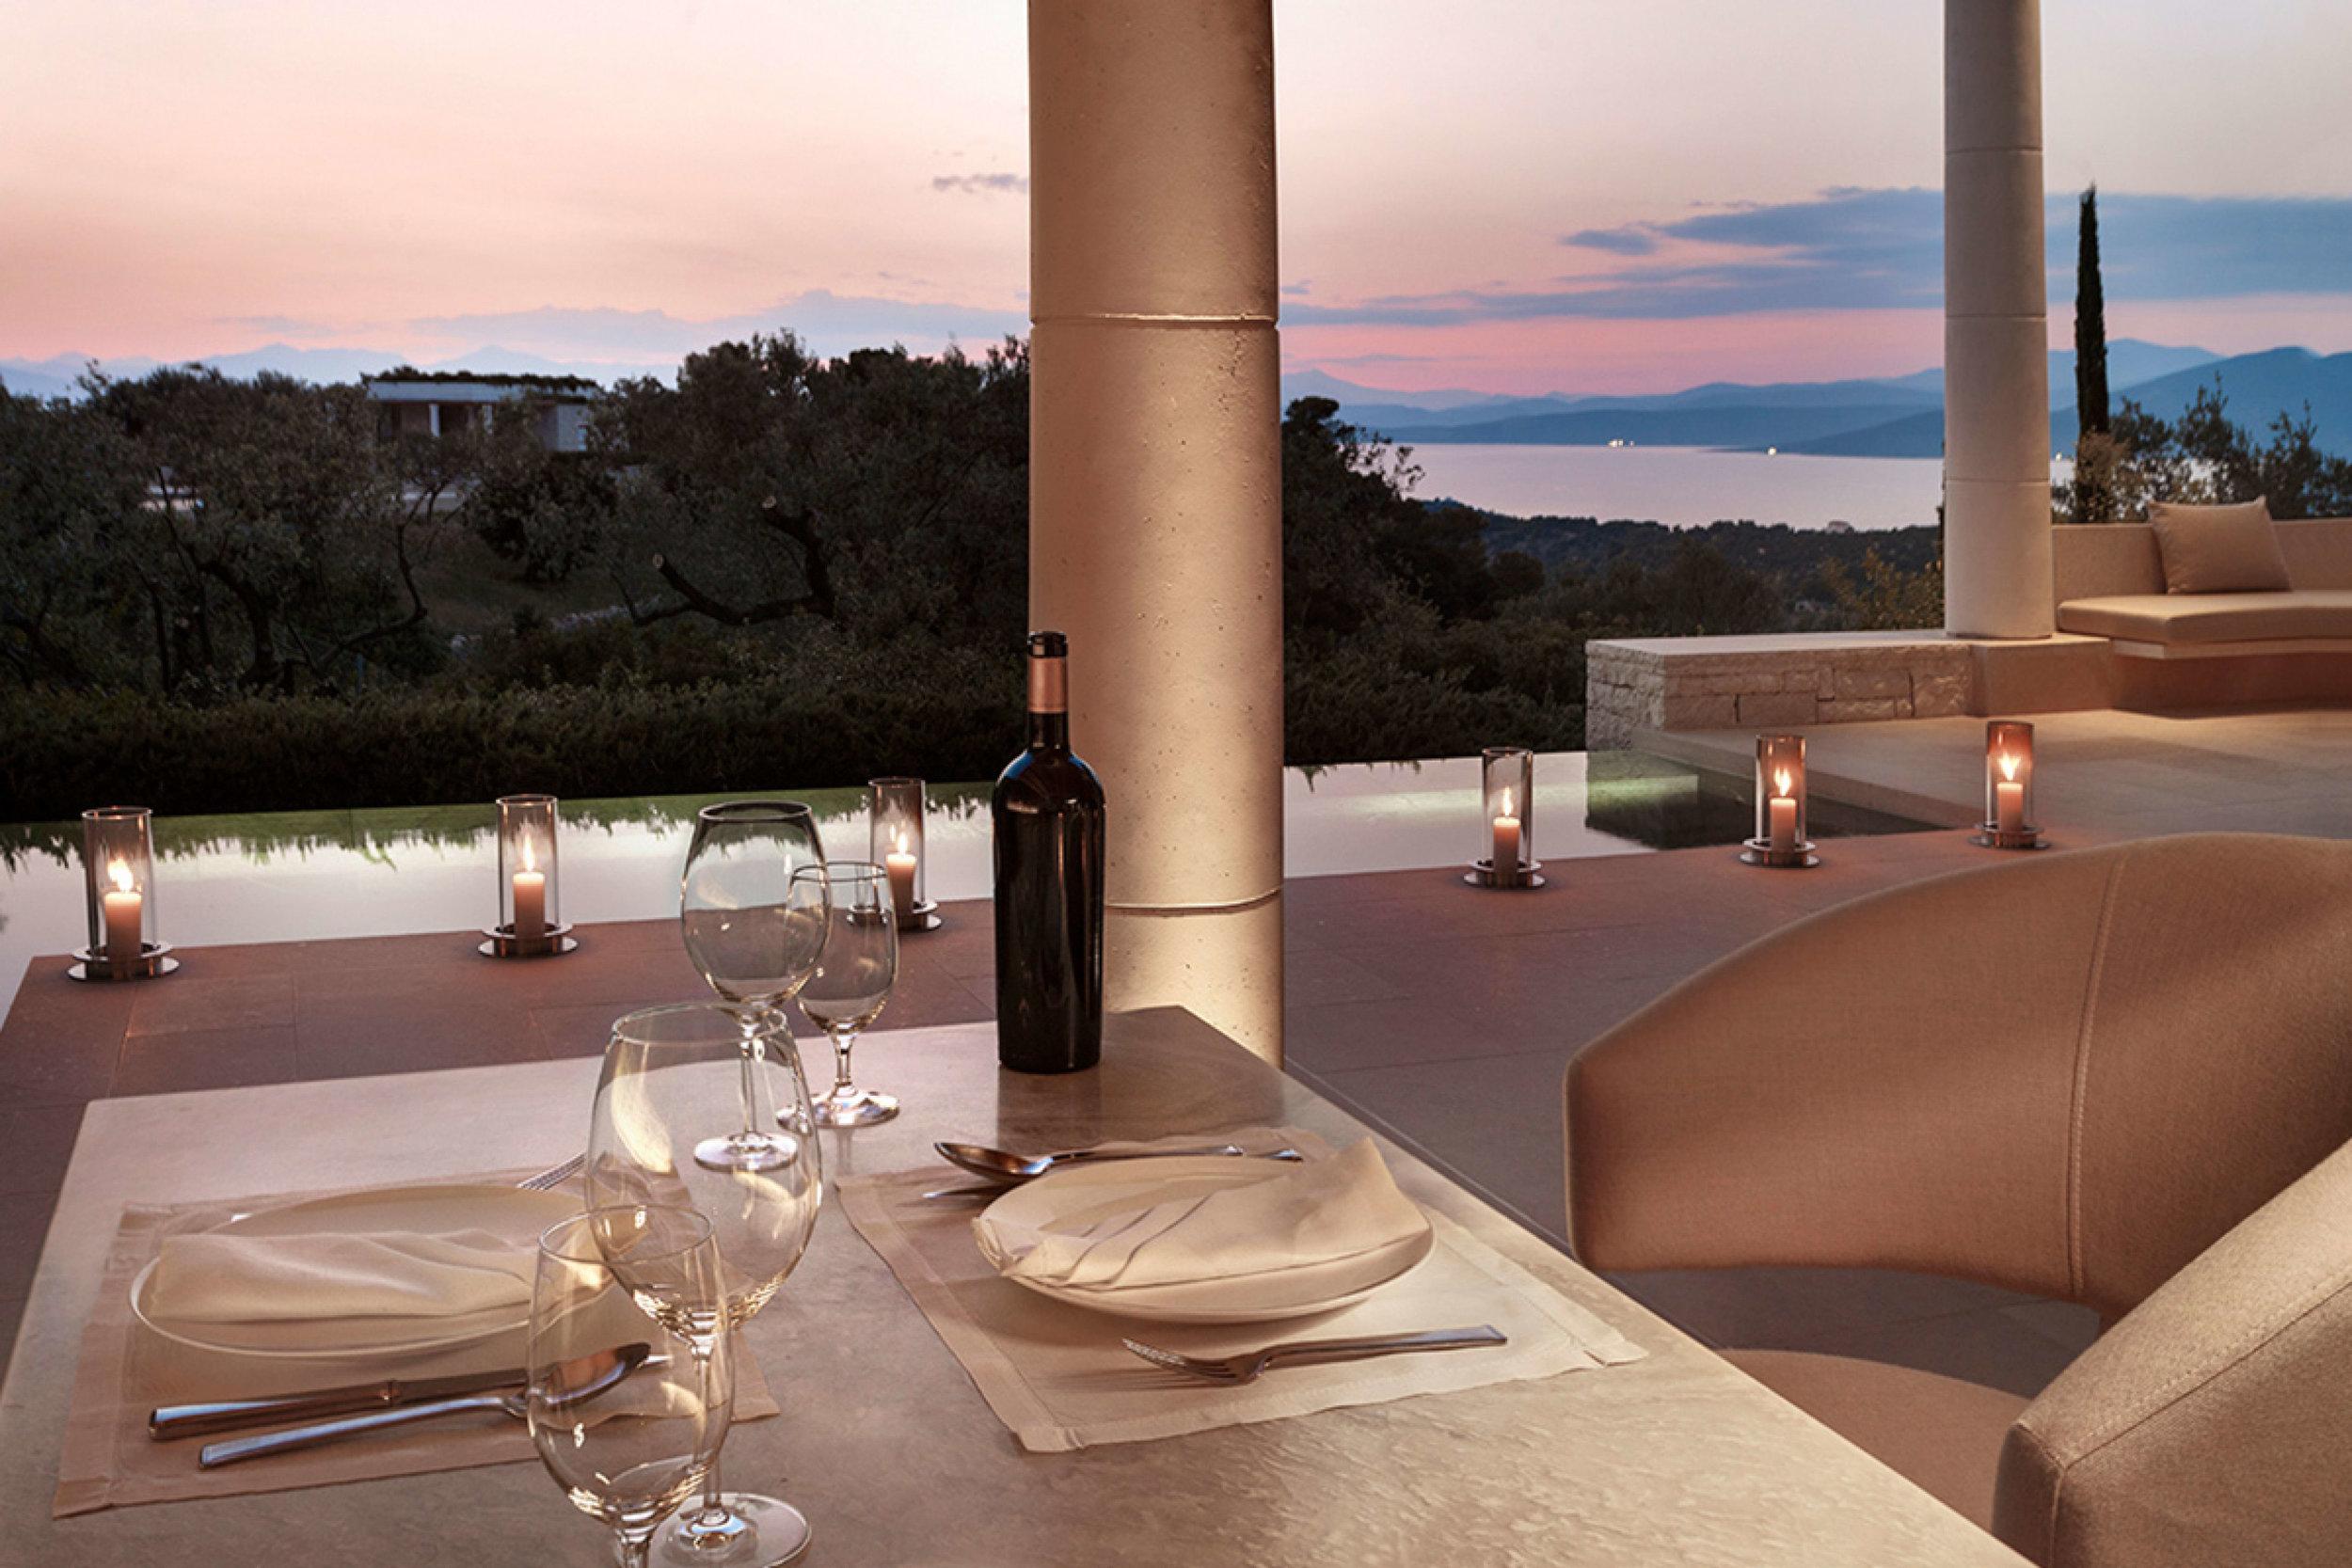 amanzoe-pavilion-in-room-dining-1200x800_0.jpg